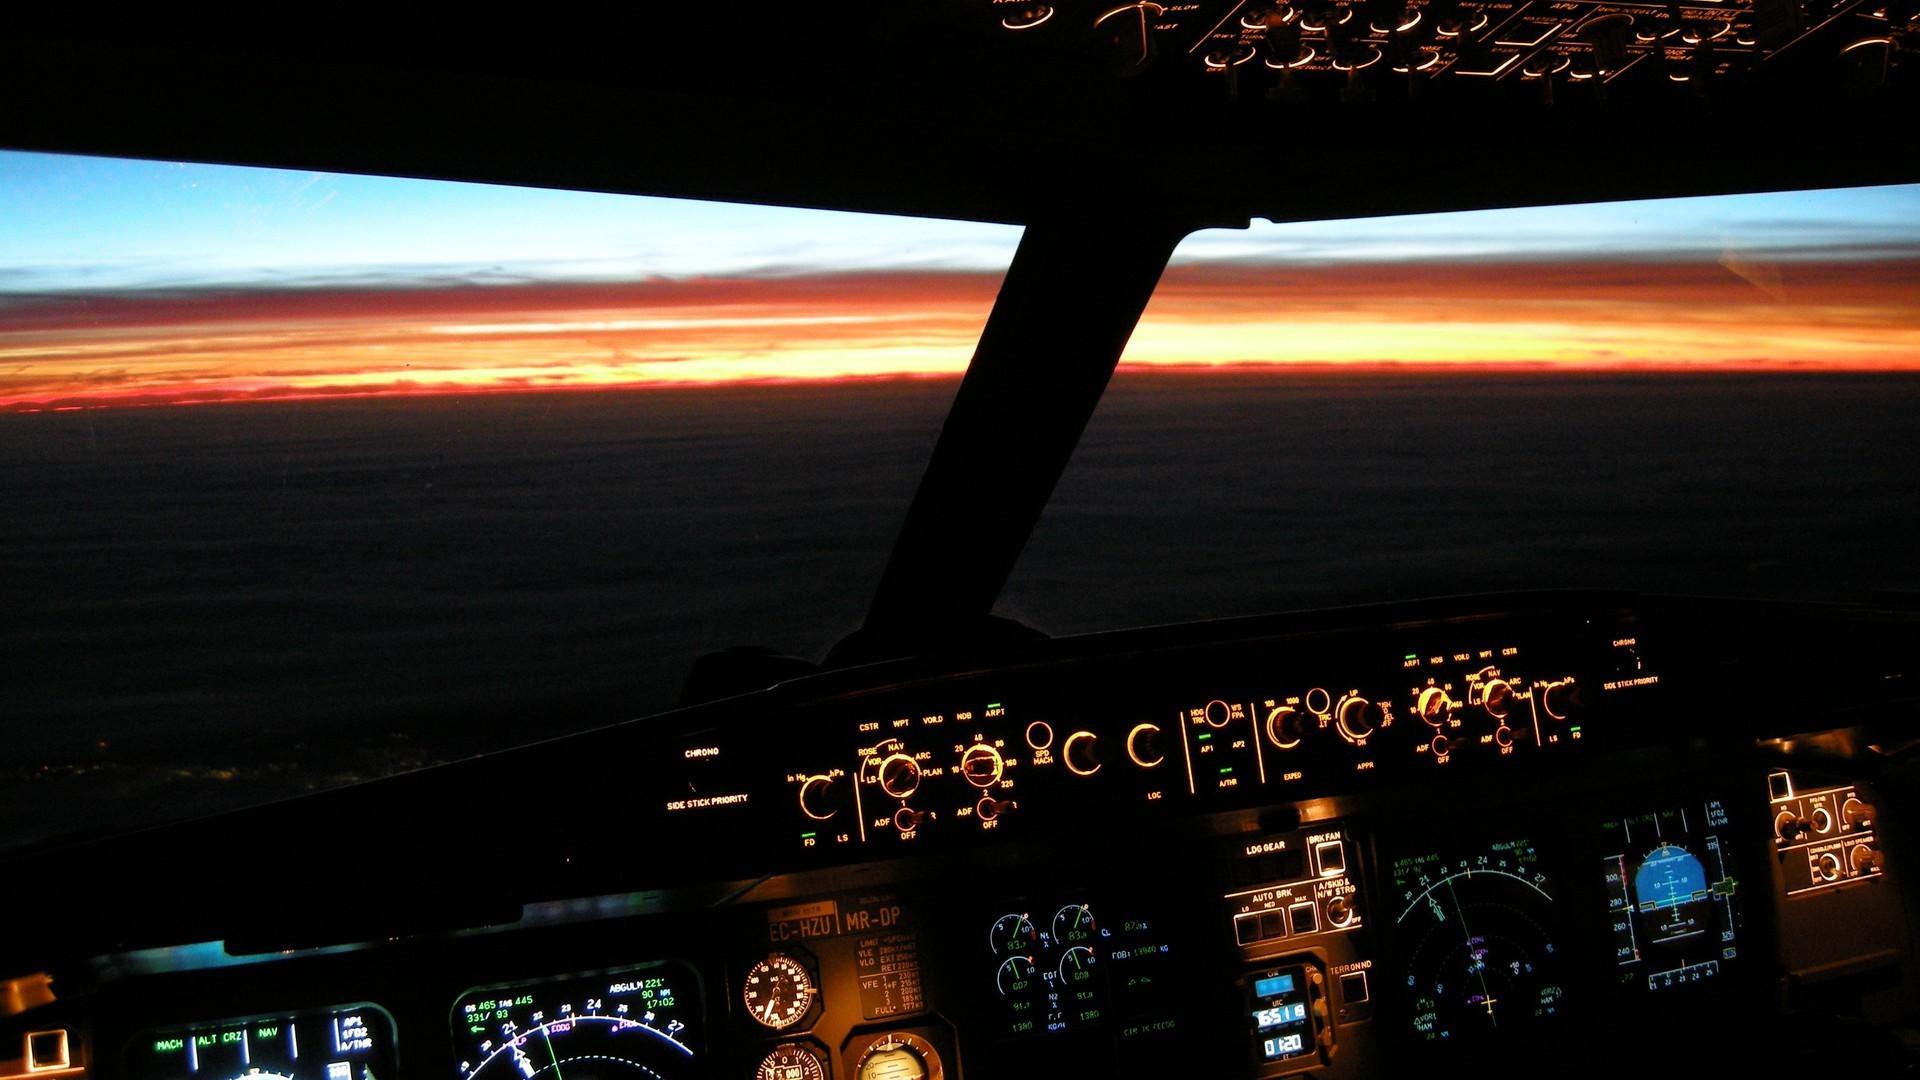 Airbus-Cockpit beleuchtet sunset wallpaper | AllWallpaper .